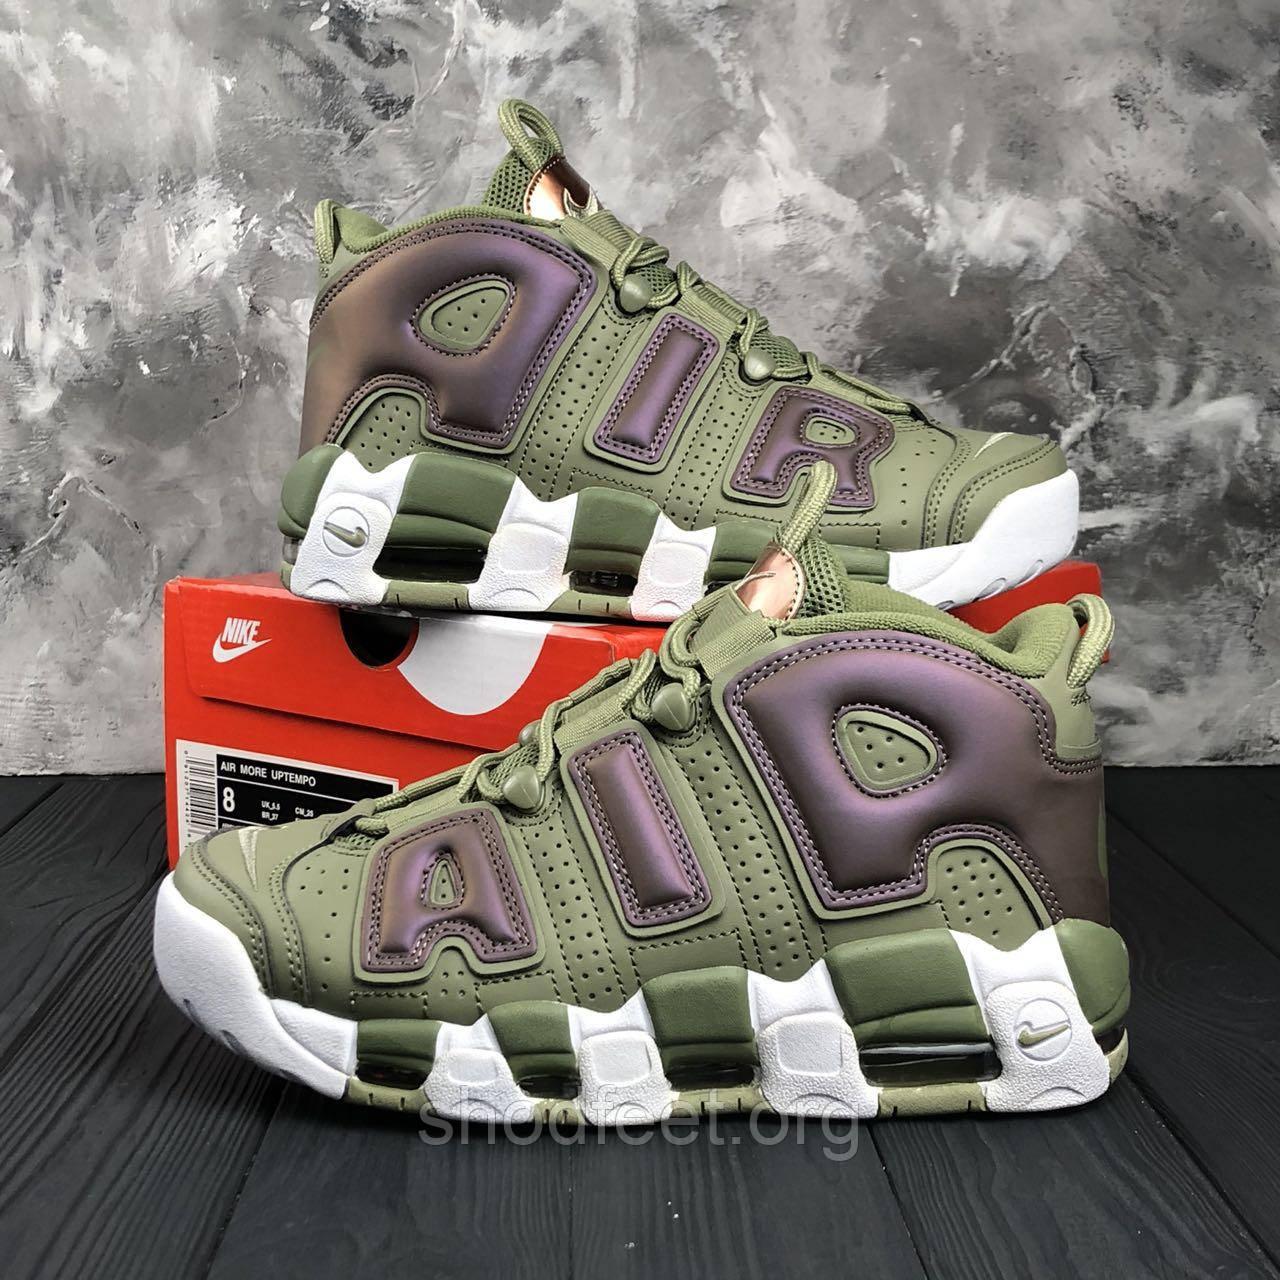 5e0c99356c962 Женские кроссовки Nike Air More Uptempo 96 Green: продажа, цена в ...